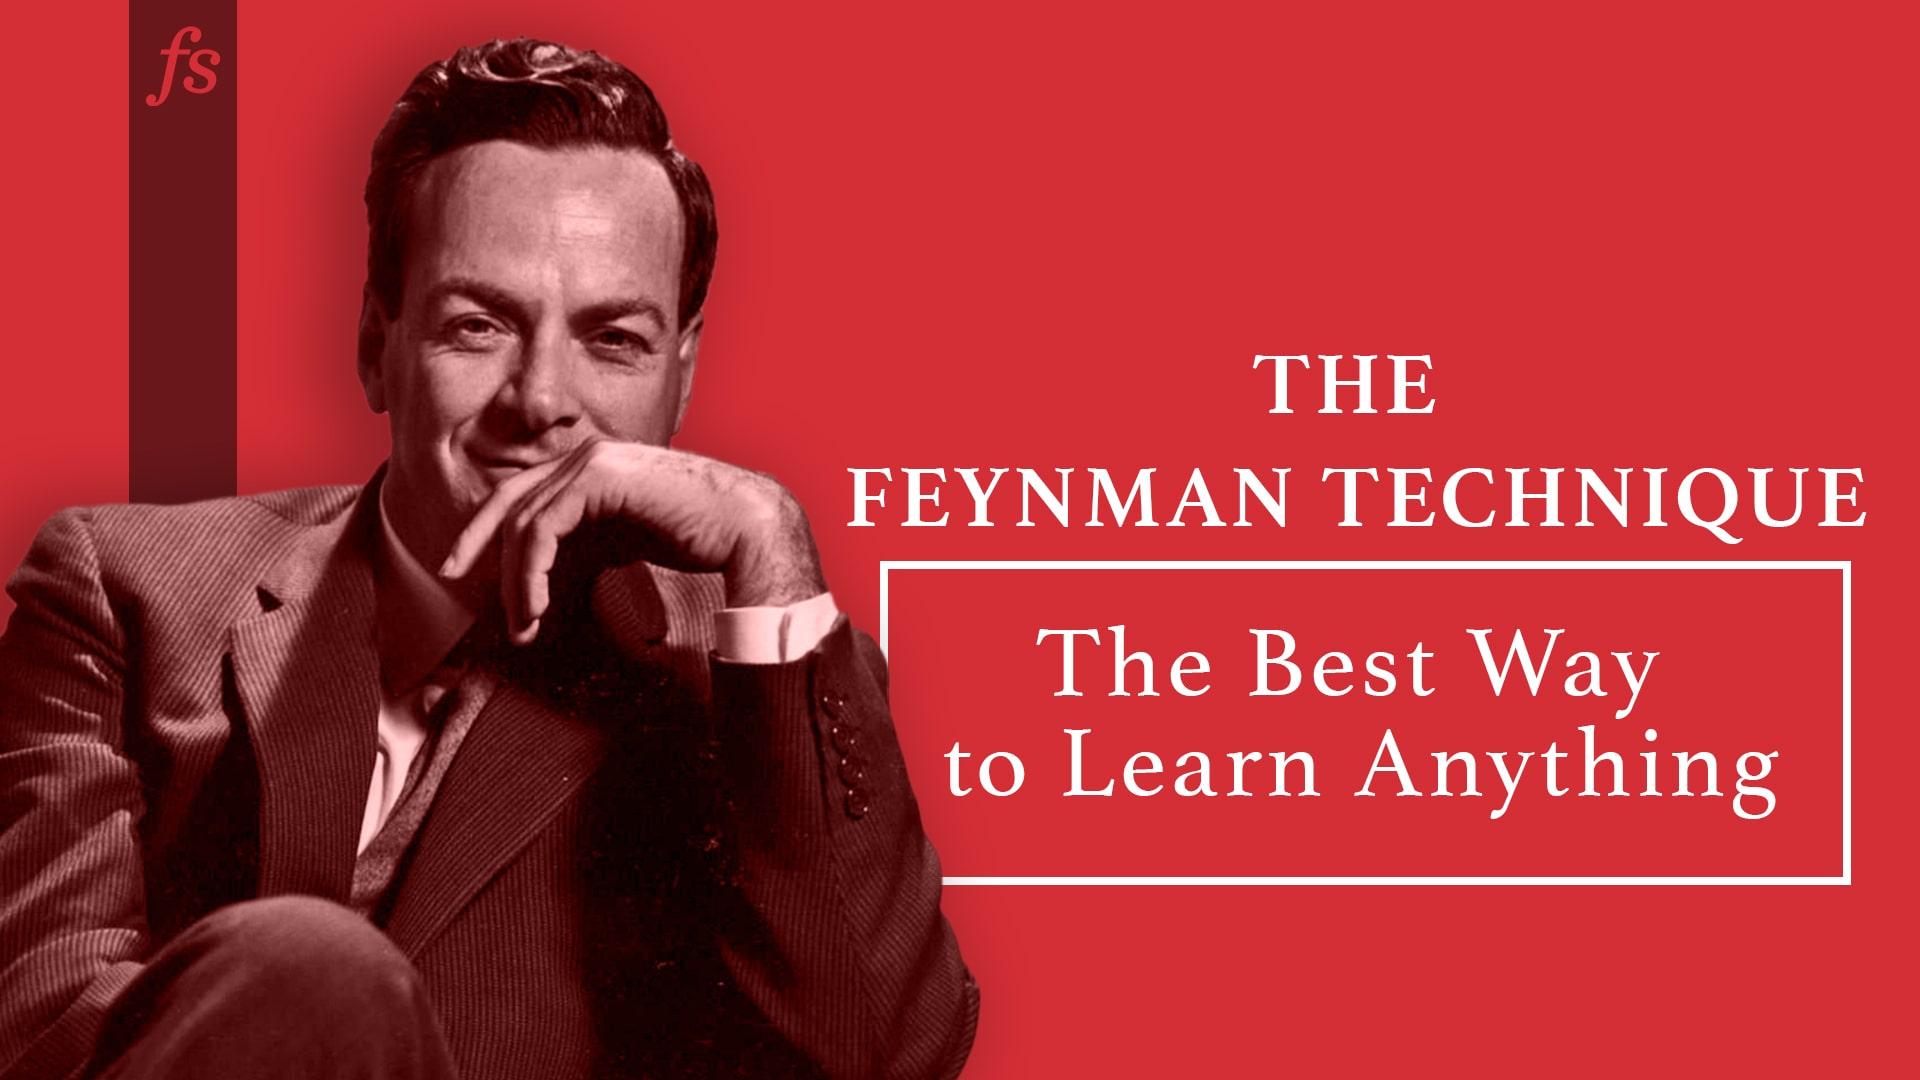 The Feynman Learning Technique